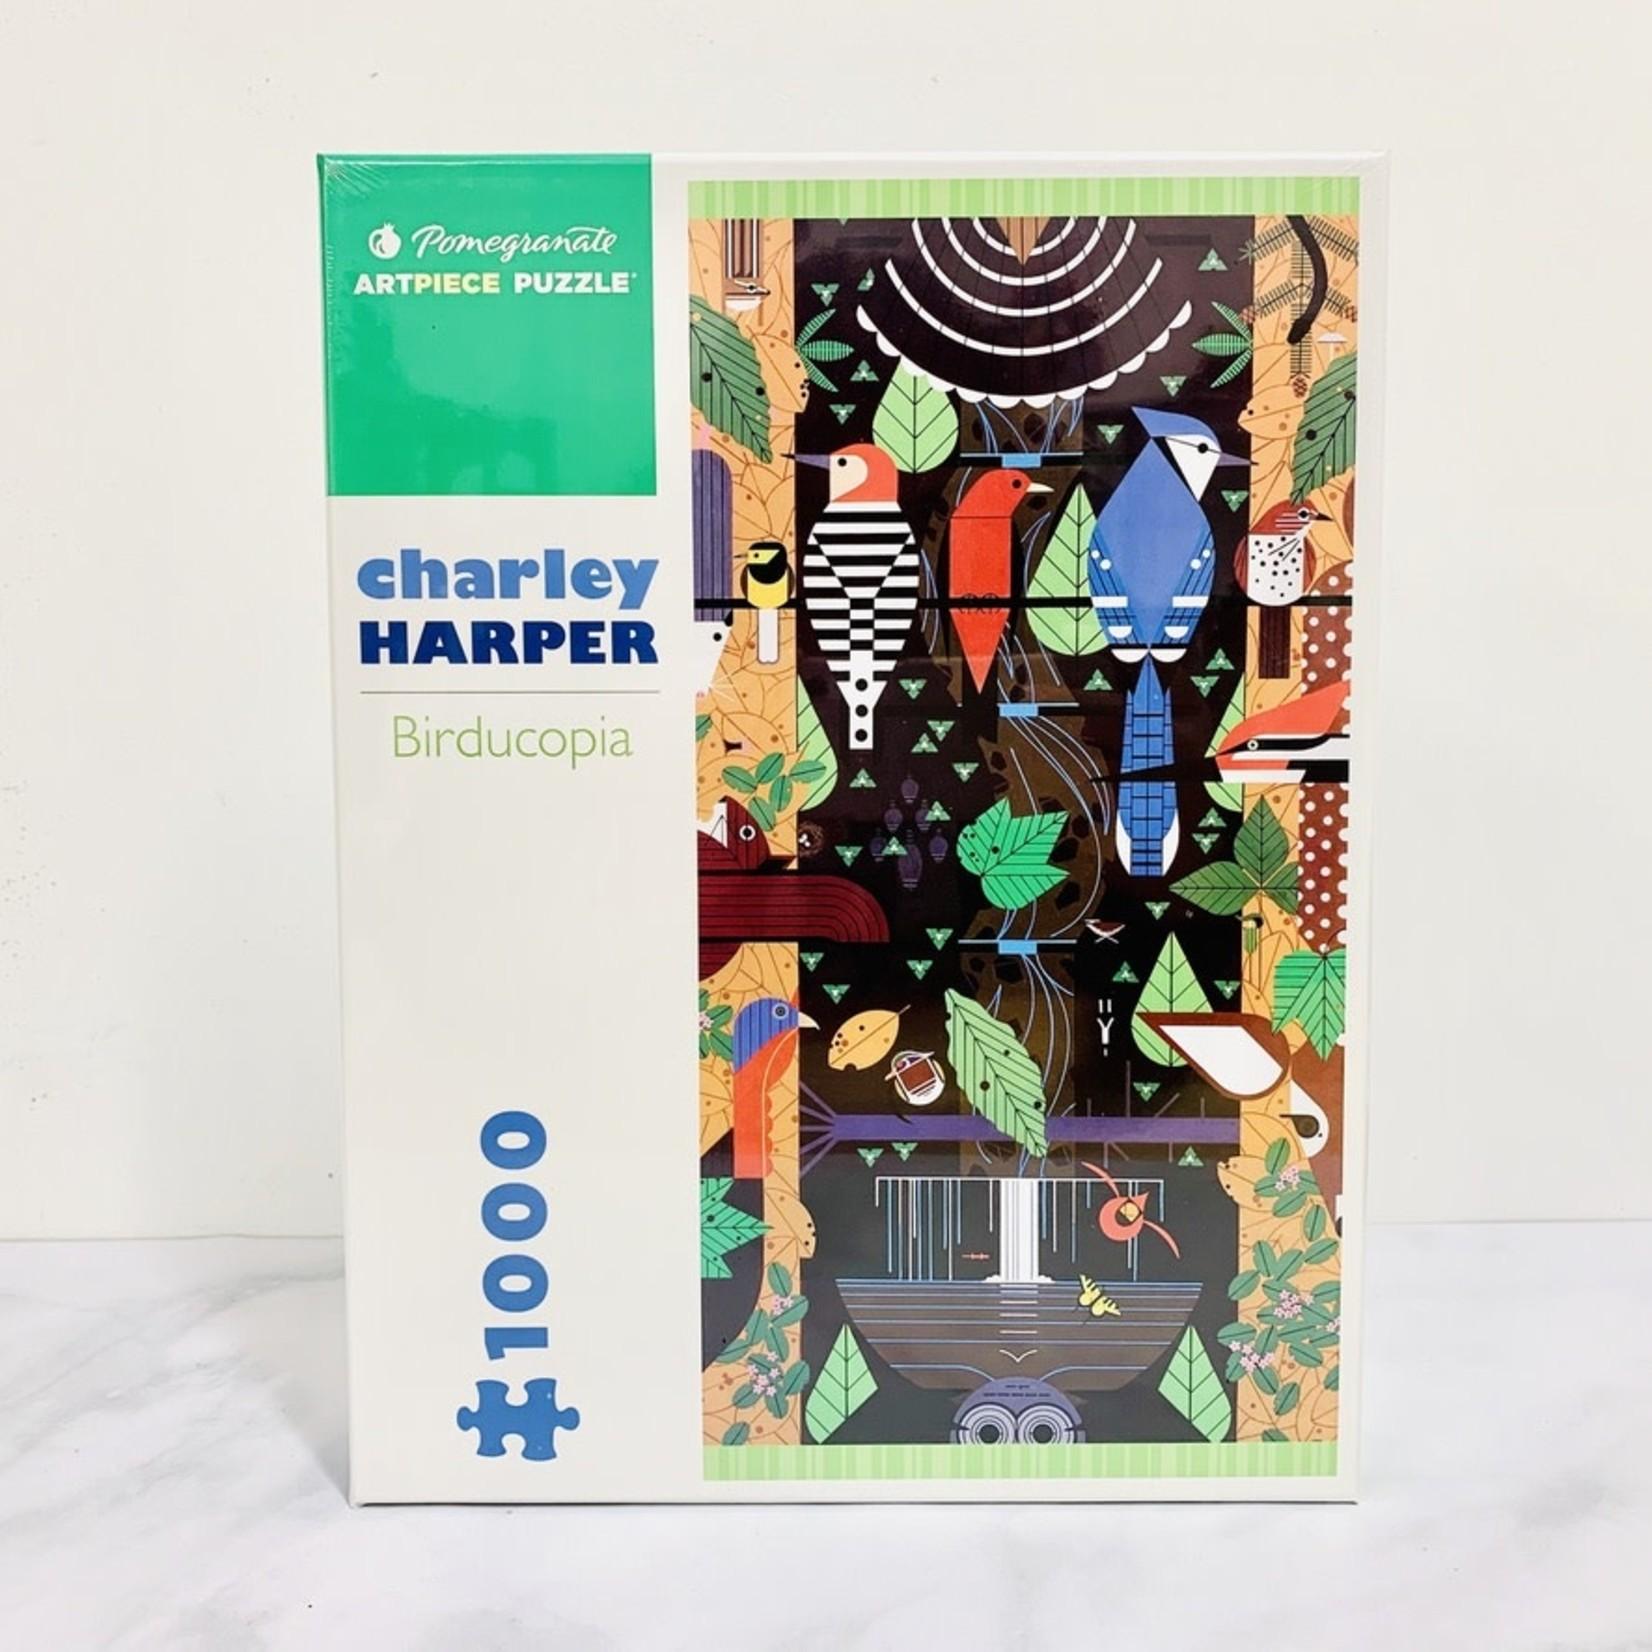 Charley Harper: Birducopia 1000-pc Puzzle